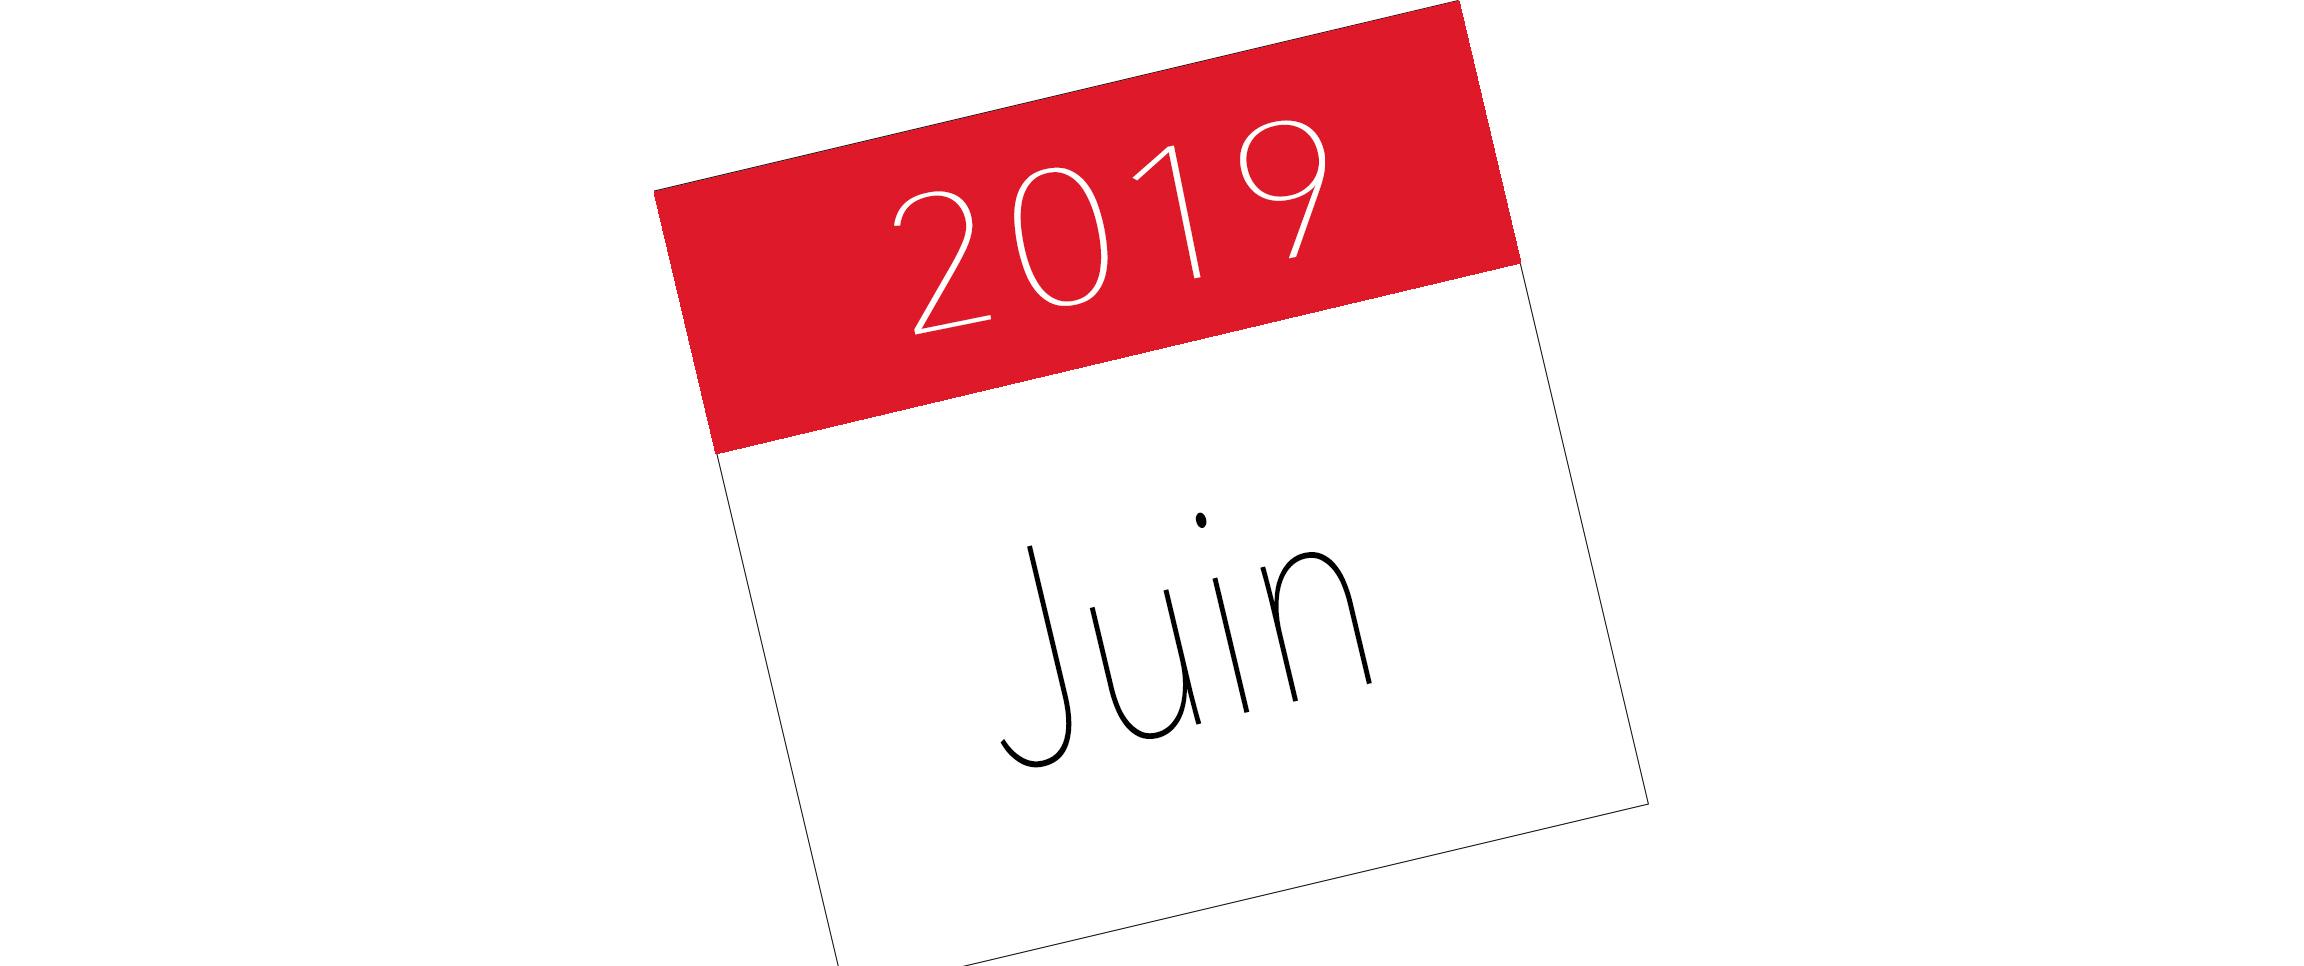 calendrier-site-juin-2019.jpg